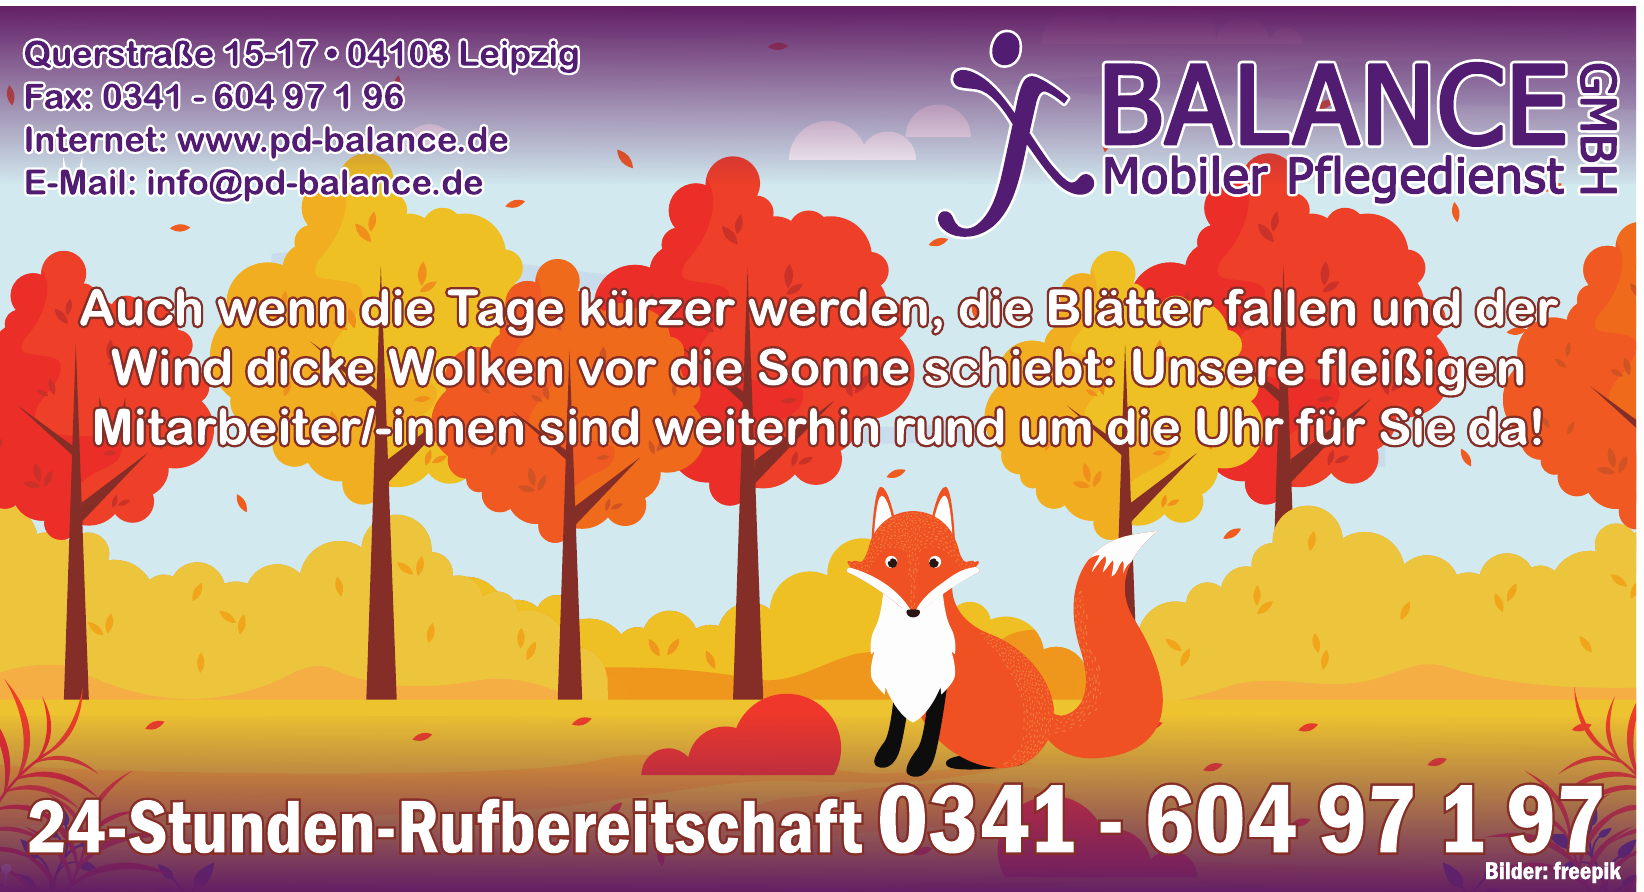 Balance Mobiler Pflegedienst GmbH